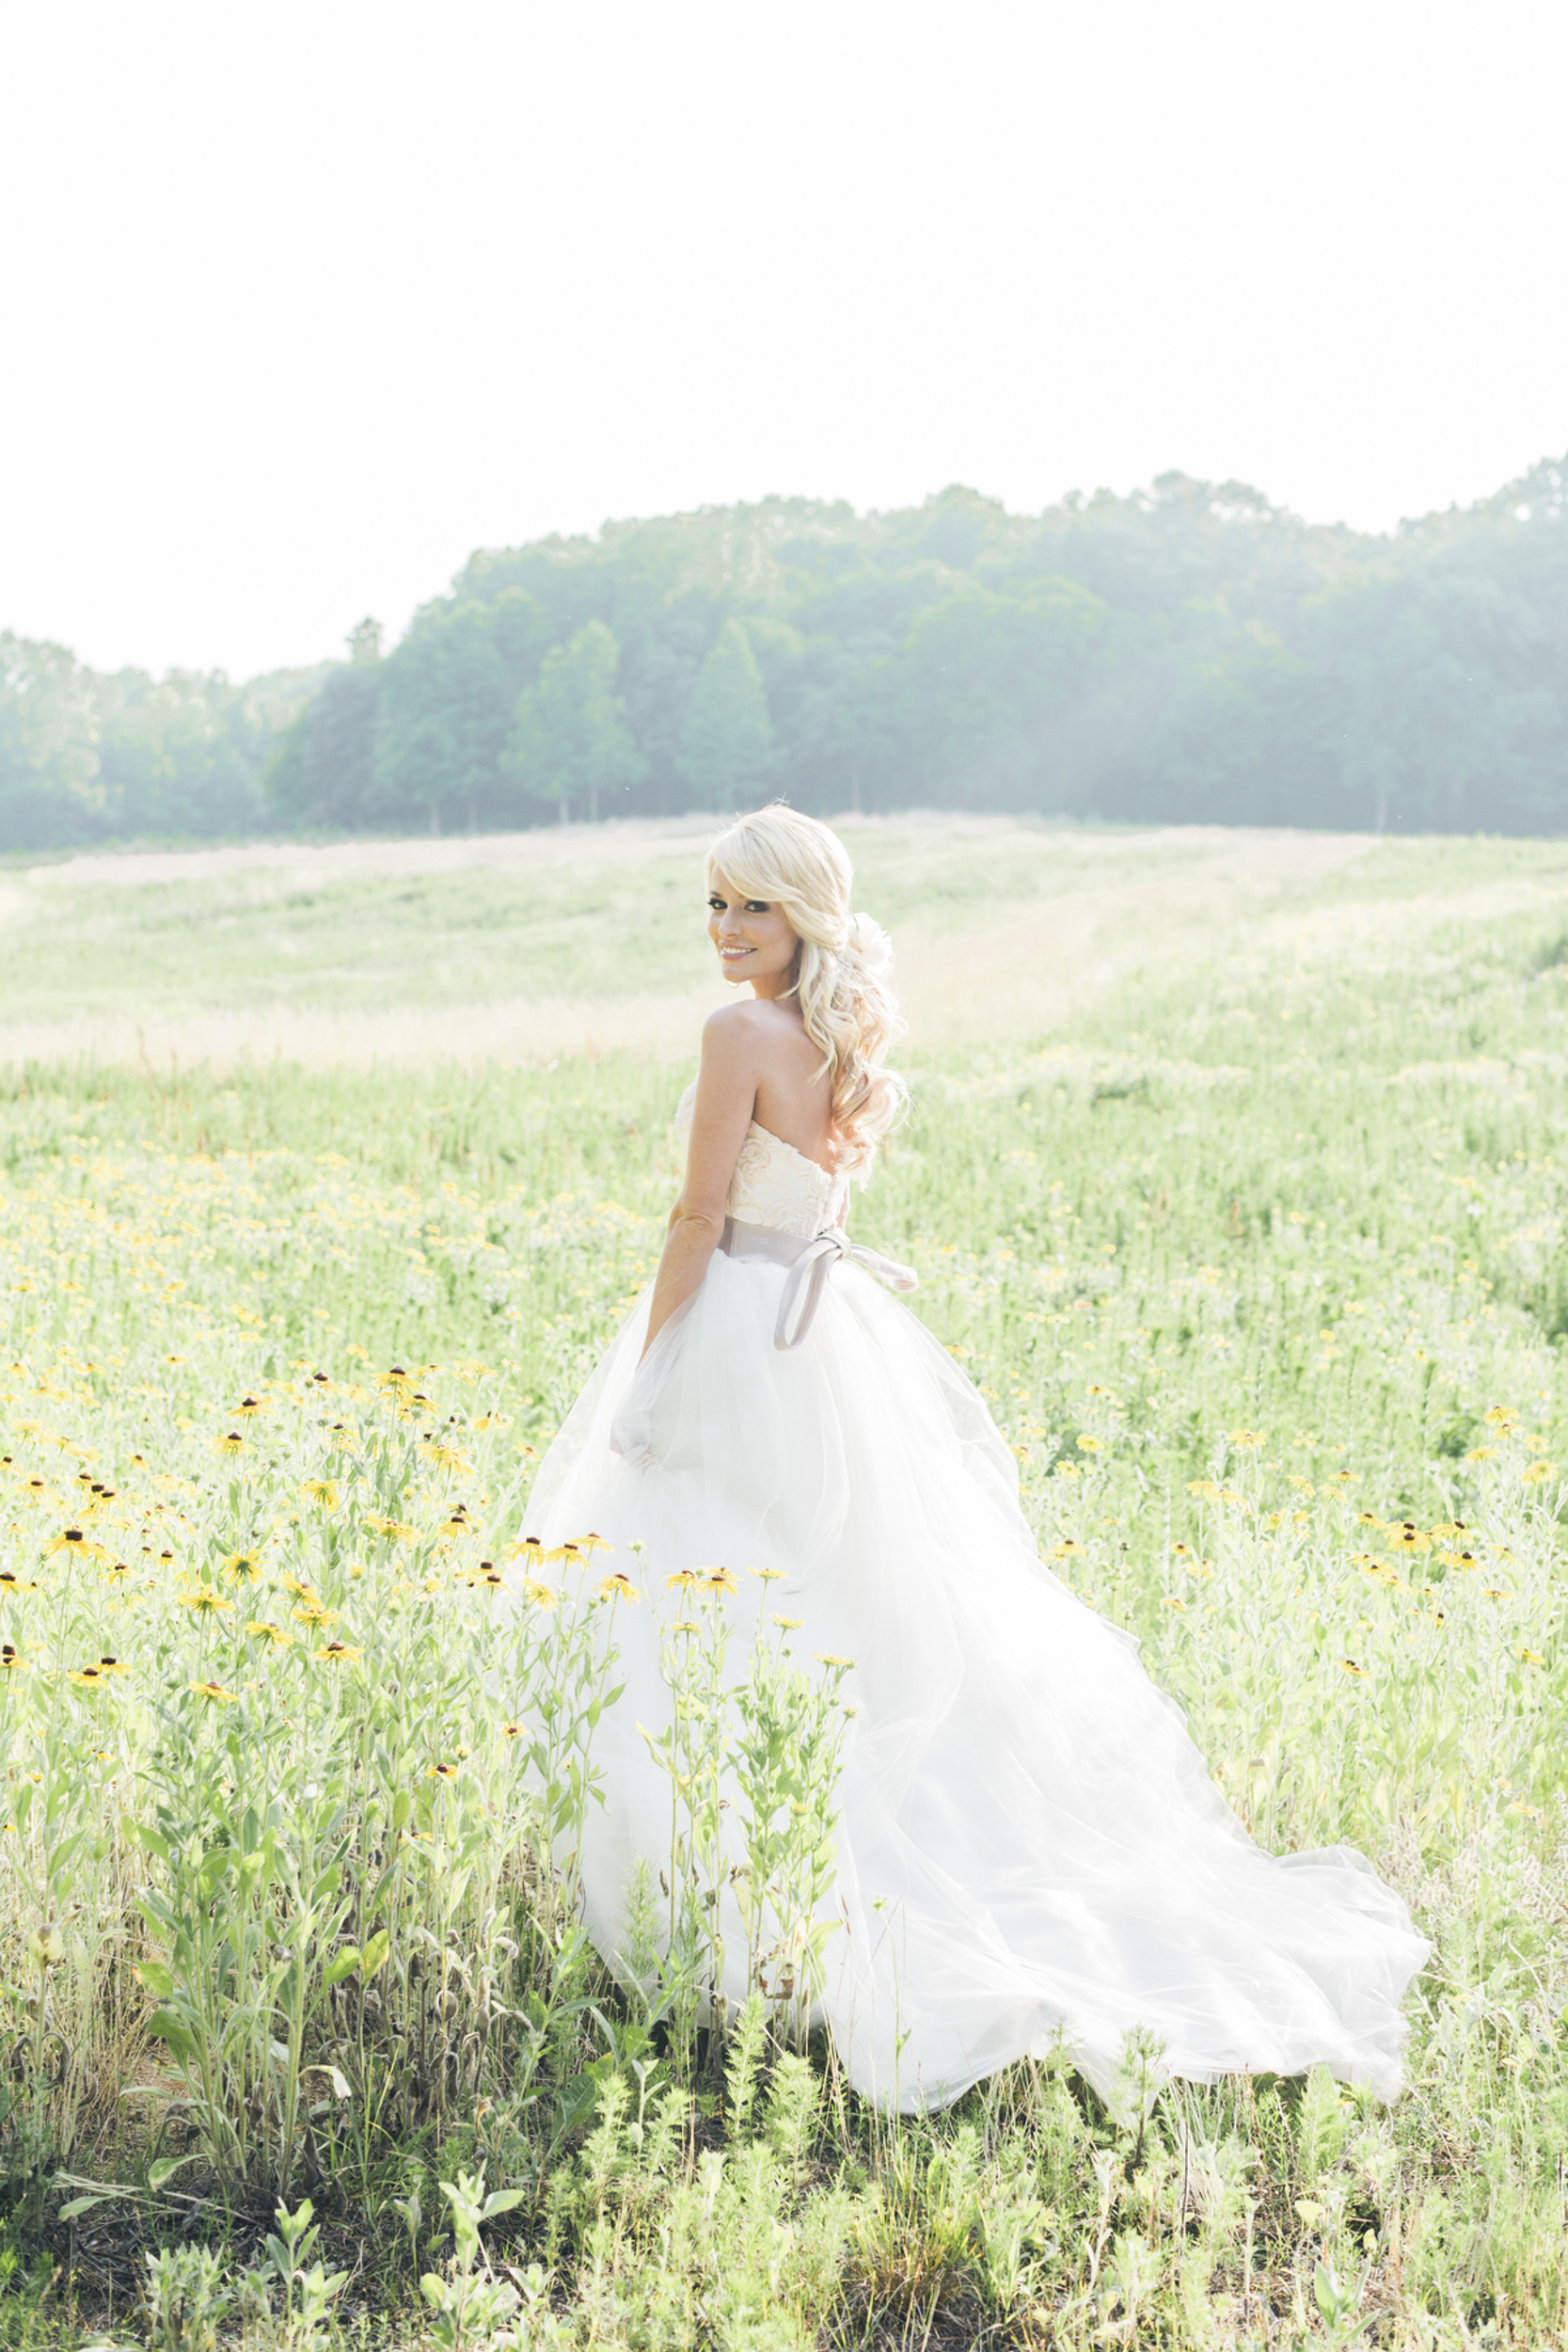 south_carolina_farm_wedding_rustic_chic_surprise_secret_luxe_wedding_bachelorette_emily_maynard_real_weddings-38.jpg